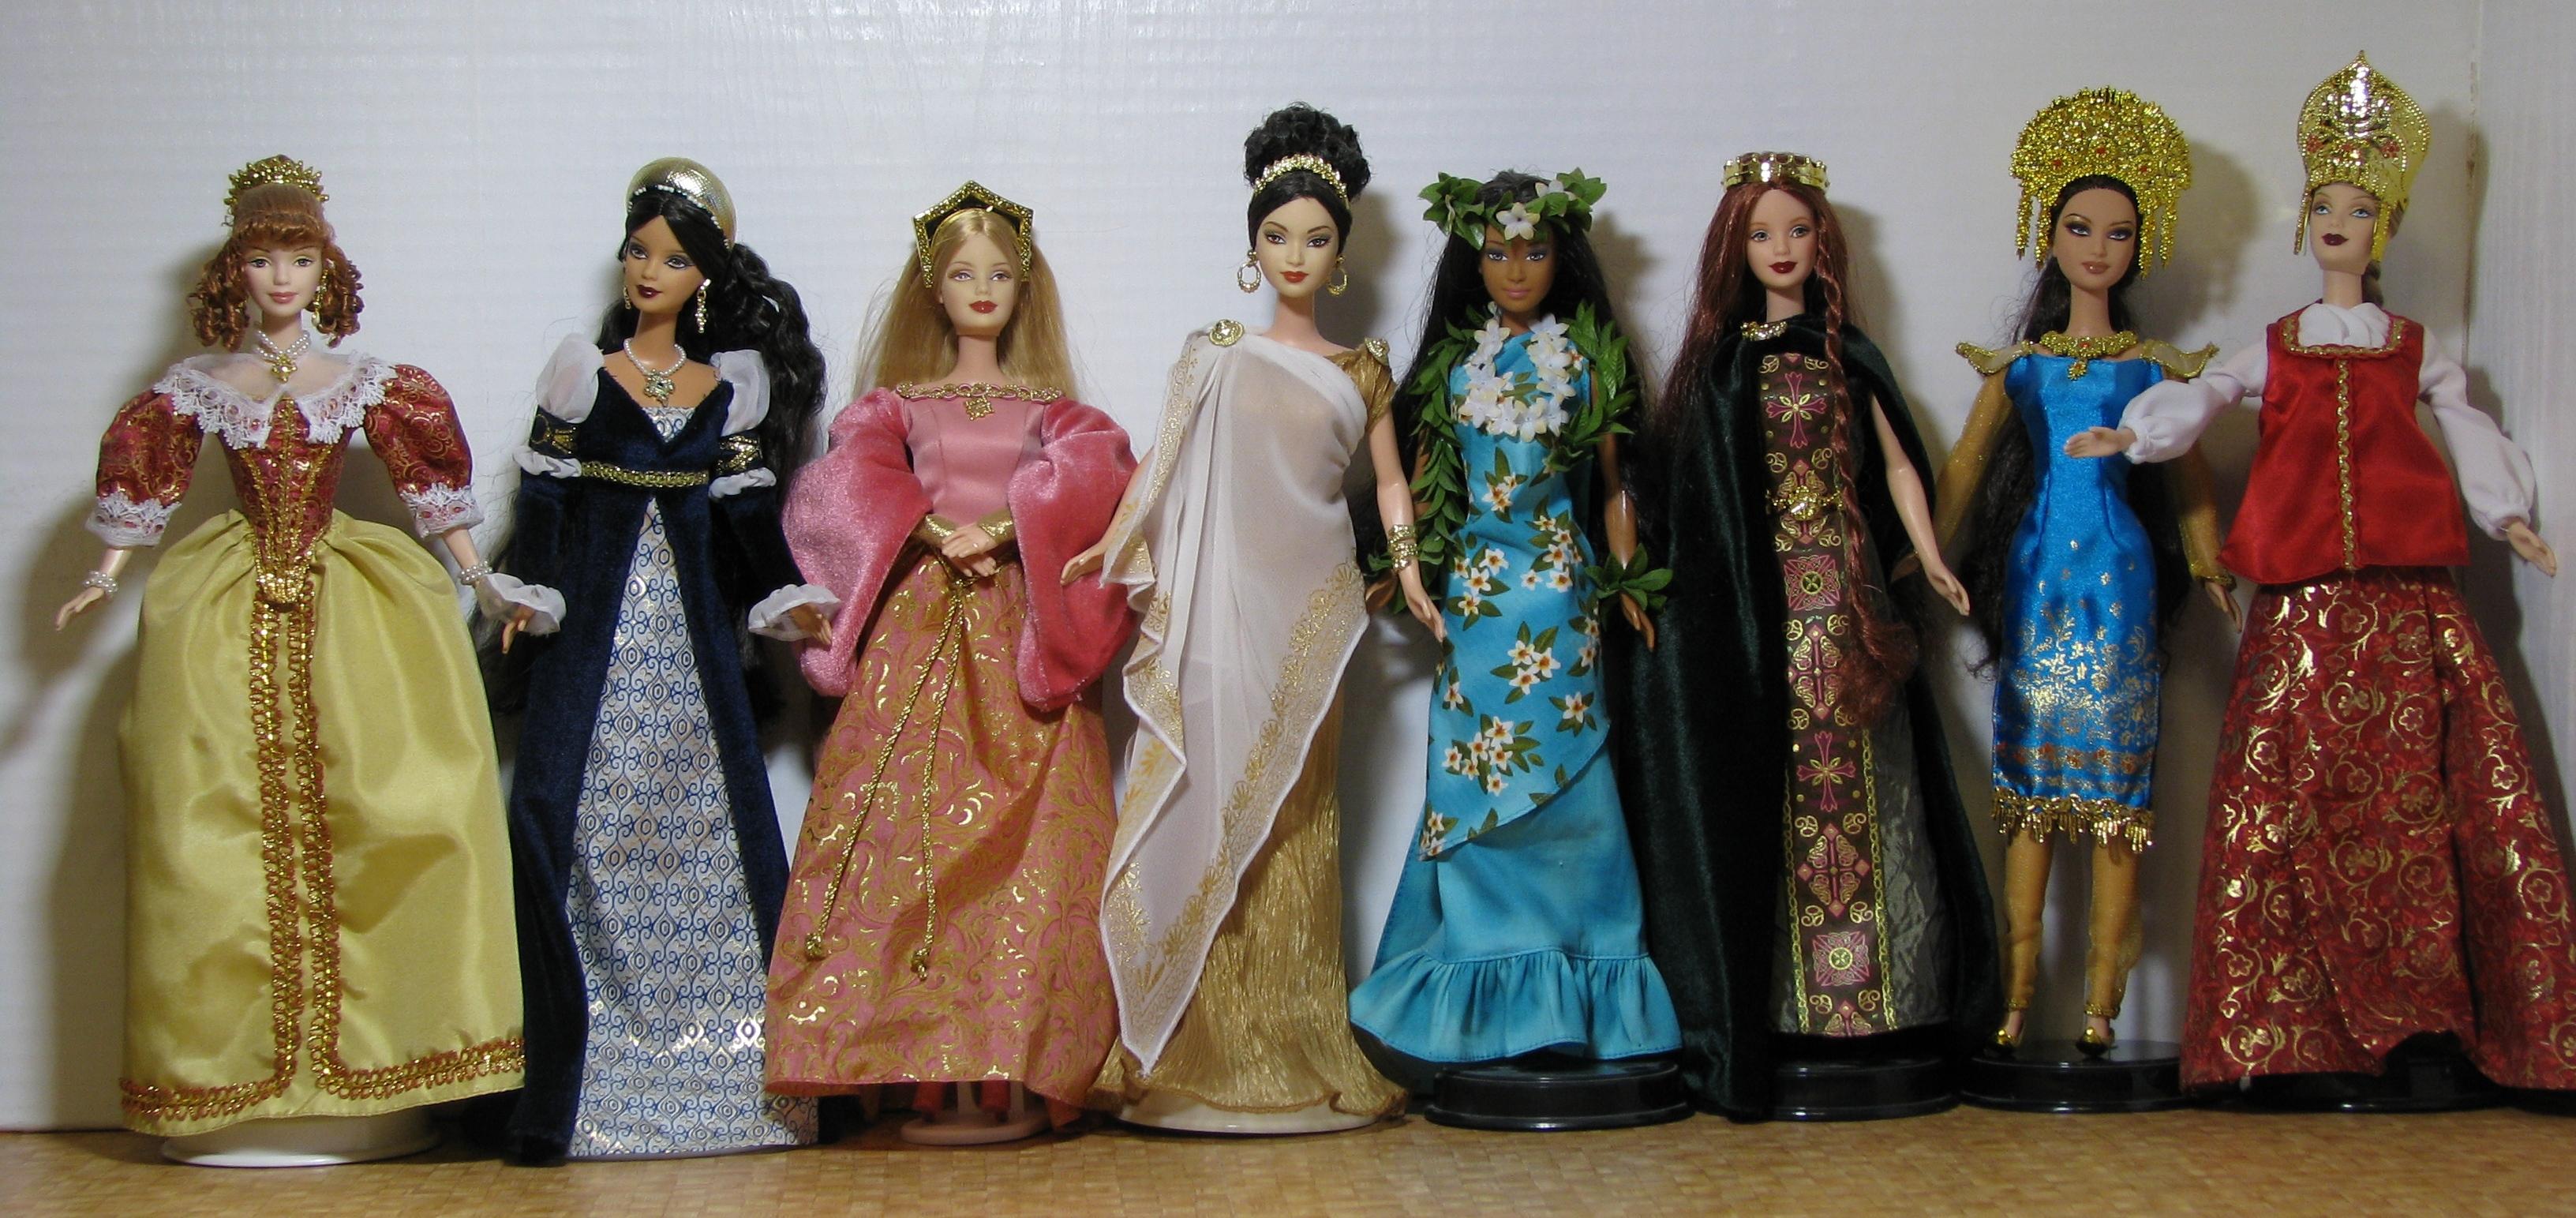 Барби принцессы и куклы мира